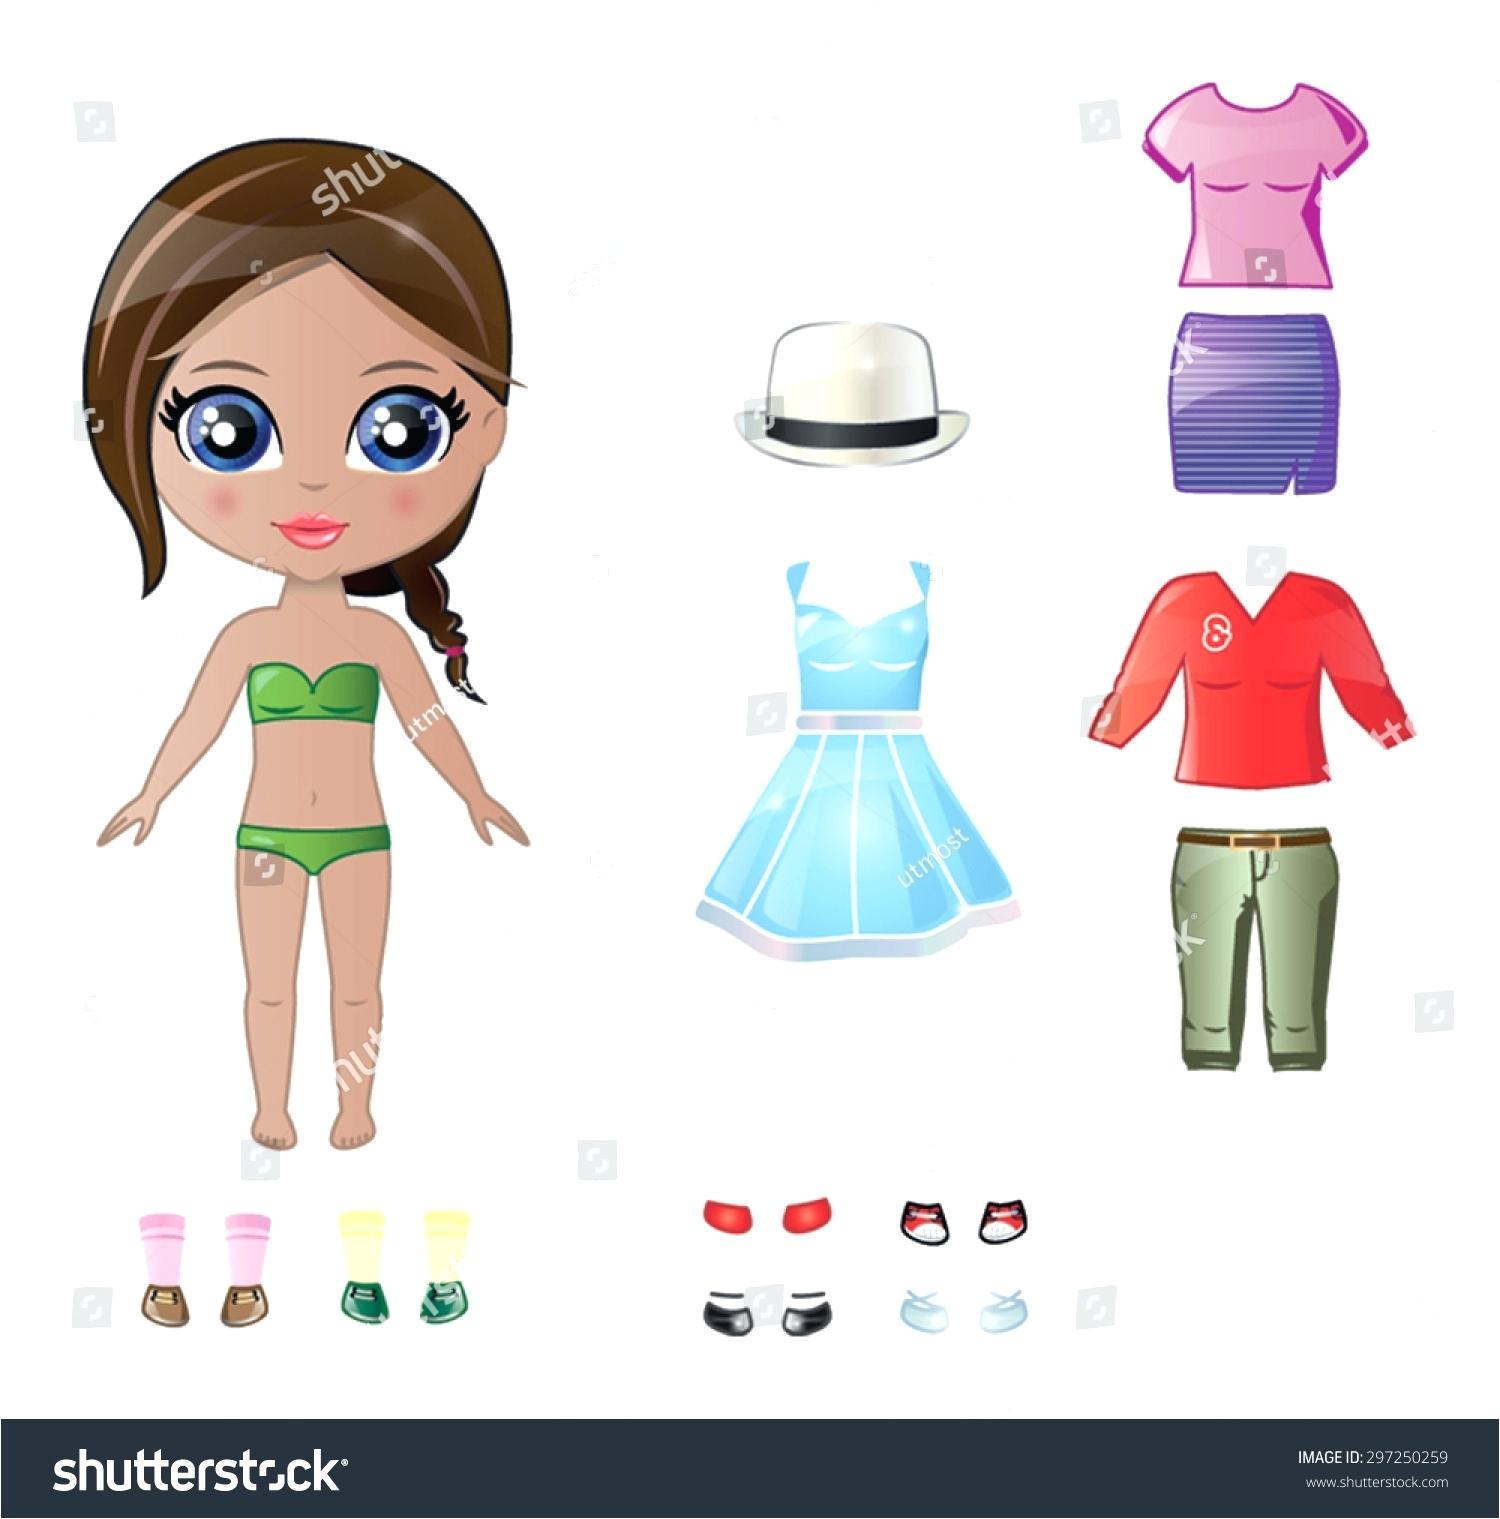 Felt Dress Up Doll Template Felt Dress Up Doll Template Image Collections Template